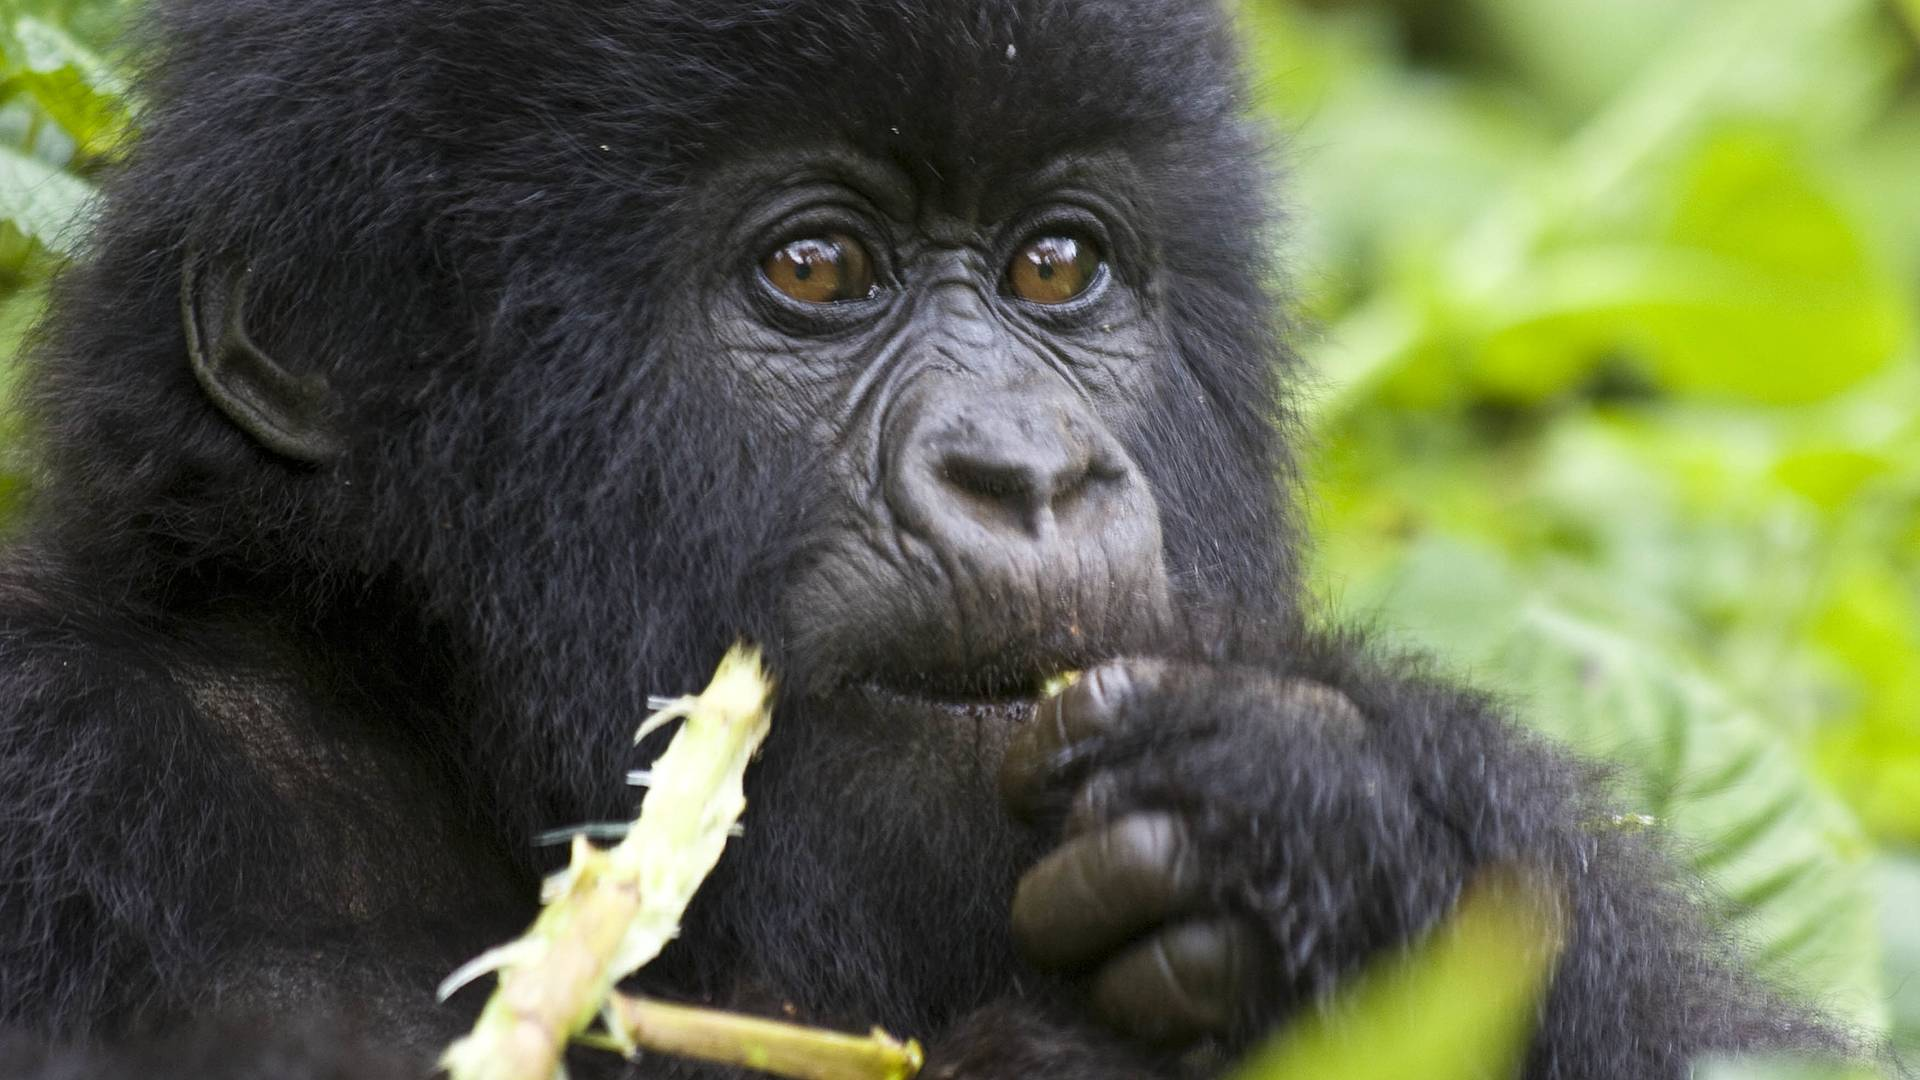 Ouganda-Rwanda, pays des volcans et des primates